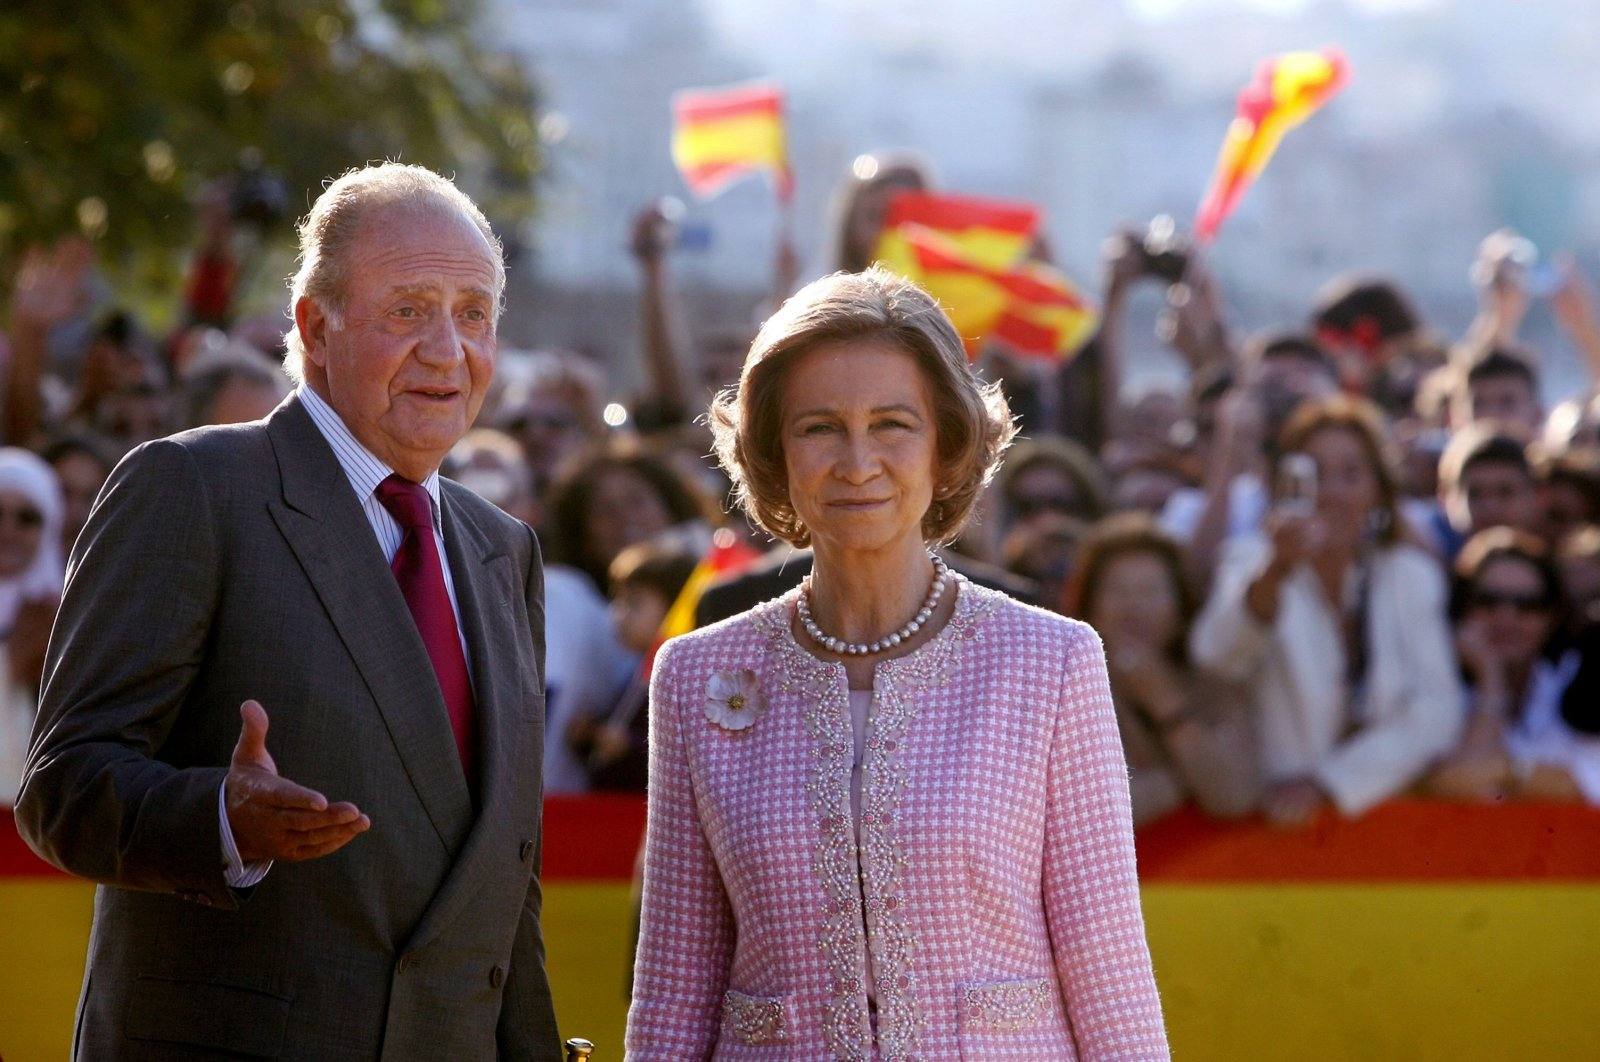 Former Spanish King Juan Carlos I and Queen Sofia visit Ceuta, Spain, Nov. 5, 2007. (AFP Photo)